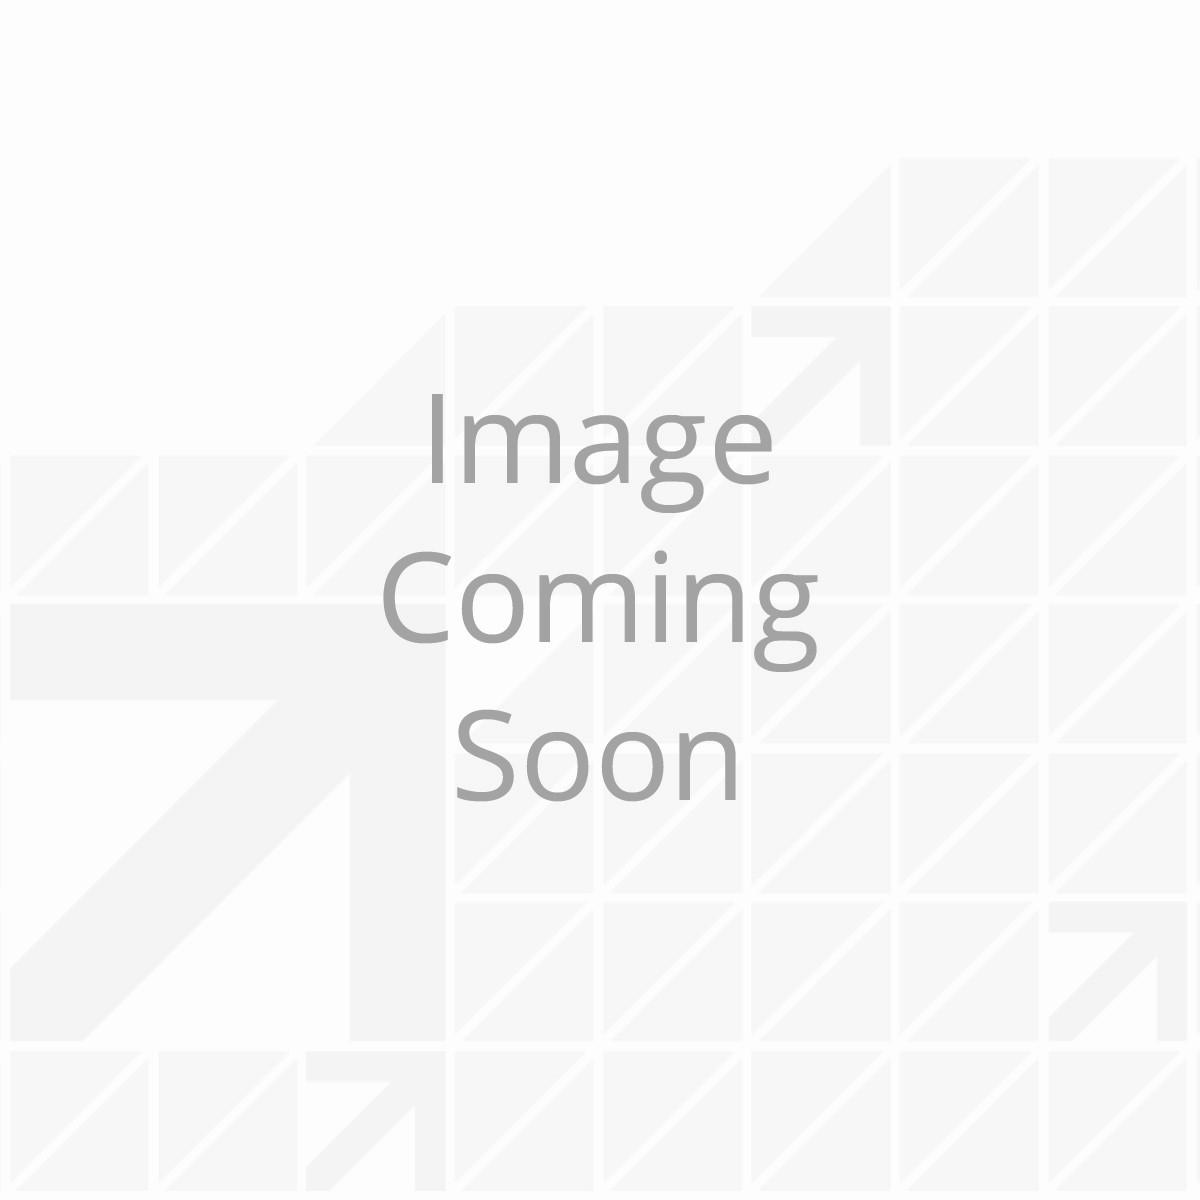 quickbite-locking-safety-pin-model-700